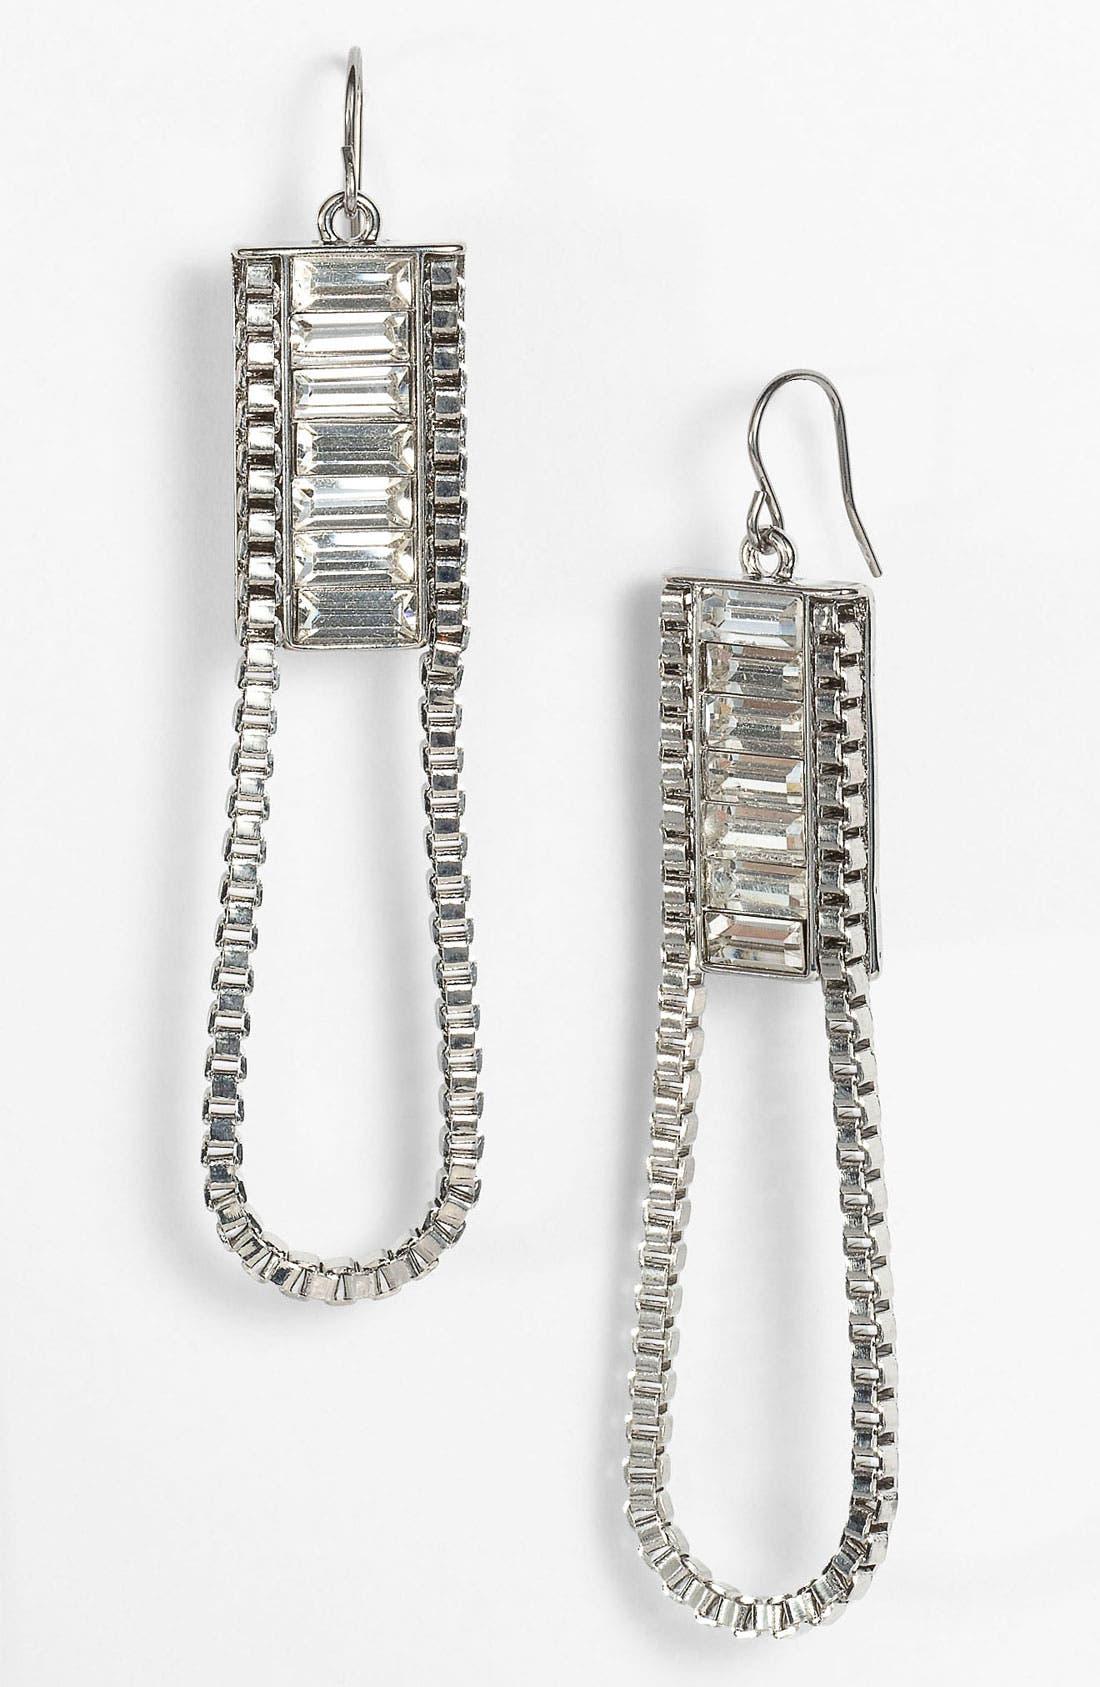 Main Image - BCBGeneration 'The Standard' Zipper Earrings